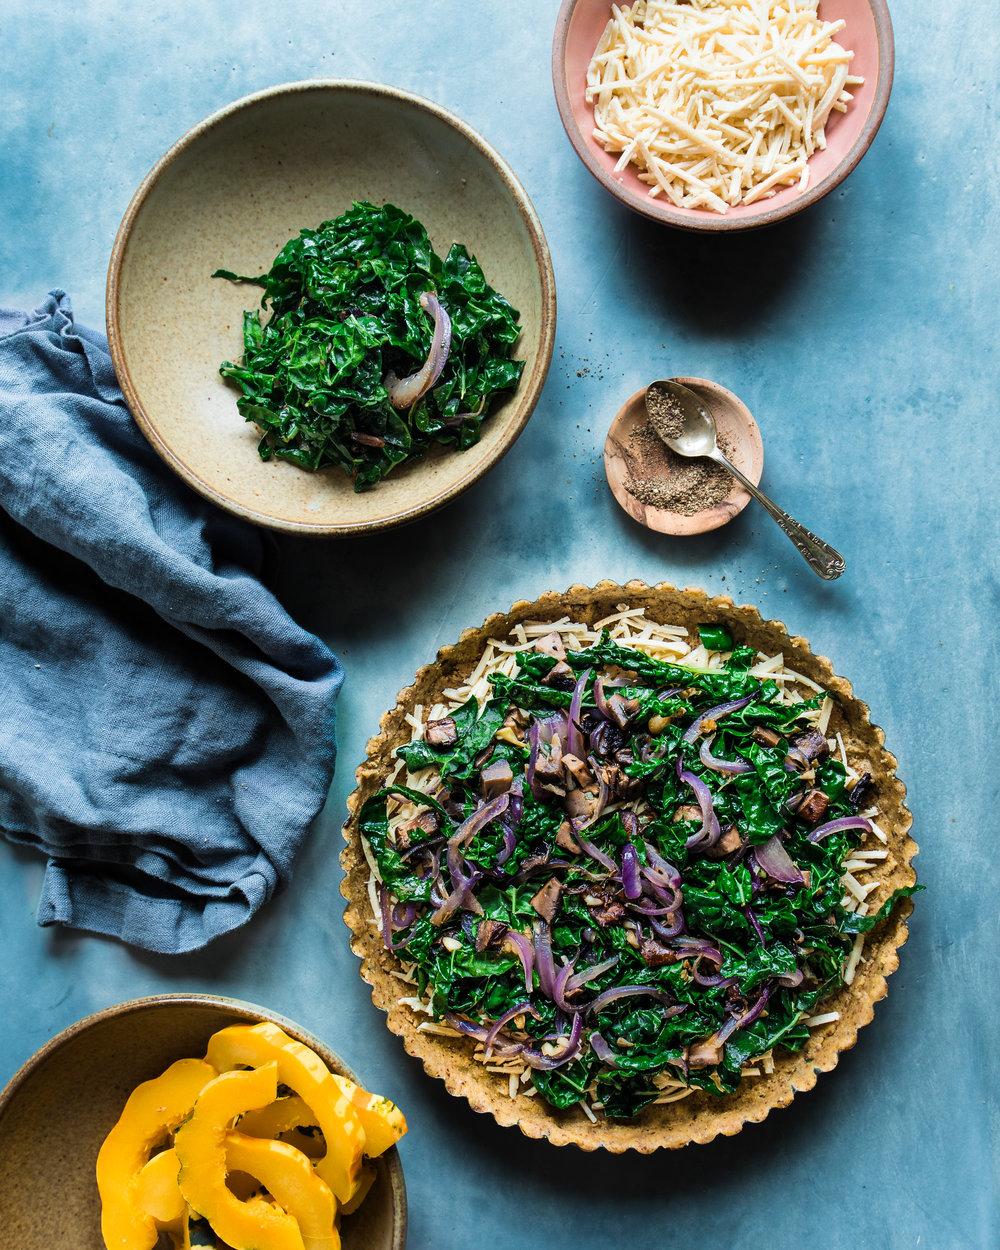 Cheesy Kale and Winter Squash Tart (Vegan, Gluten-Free)